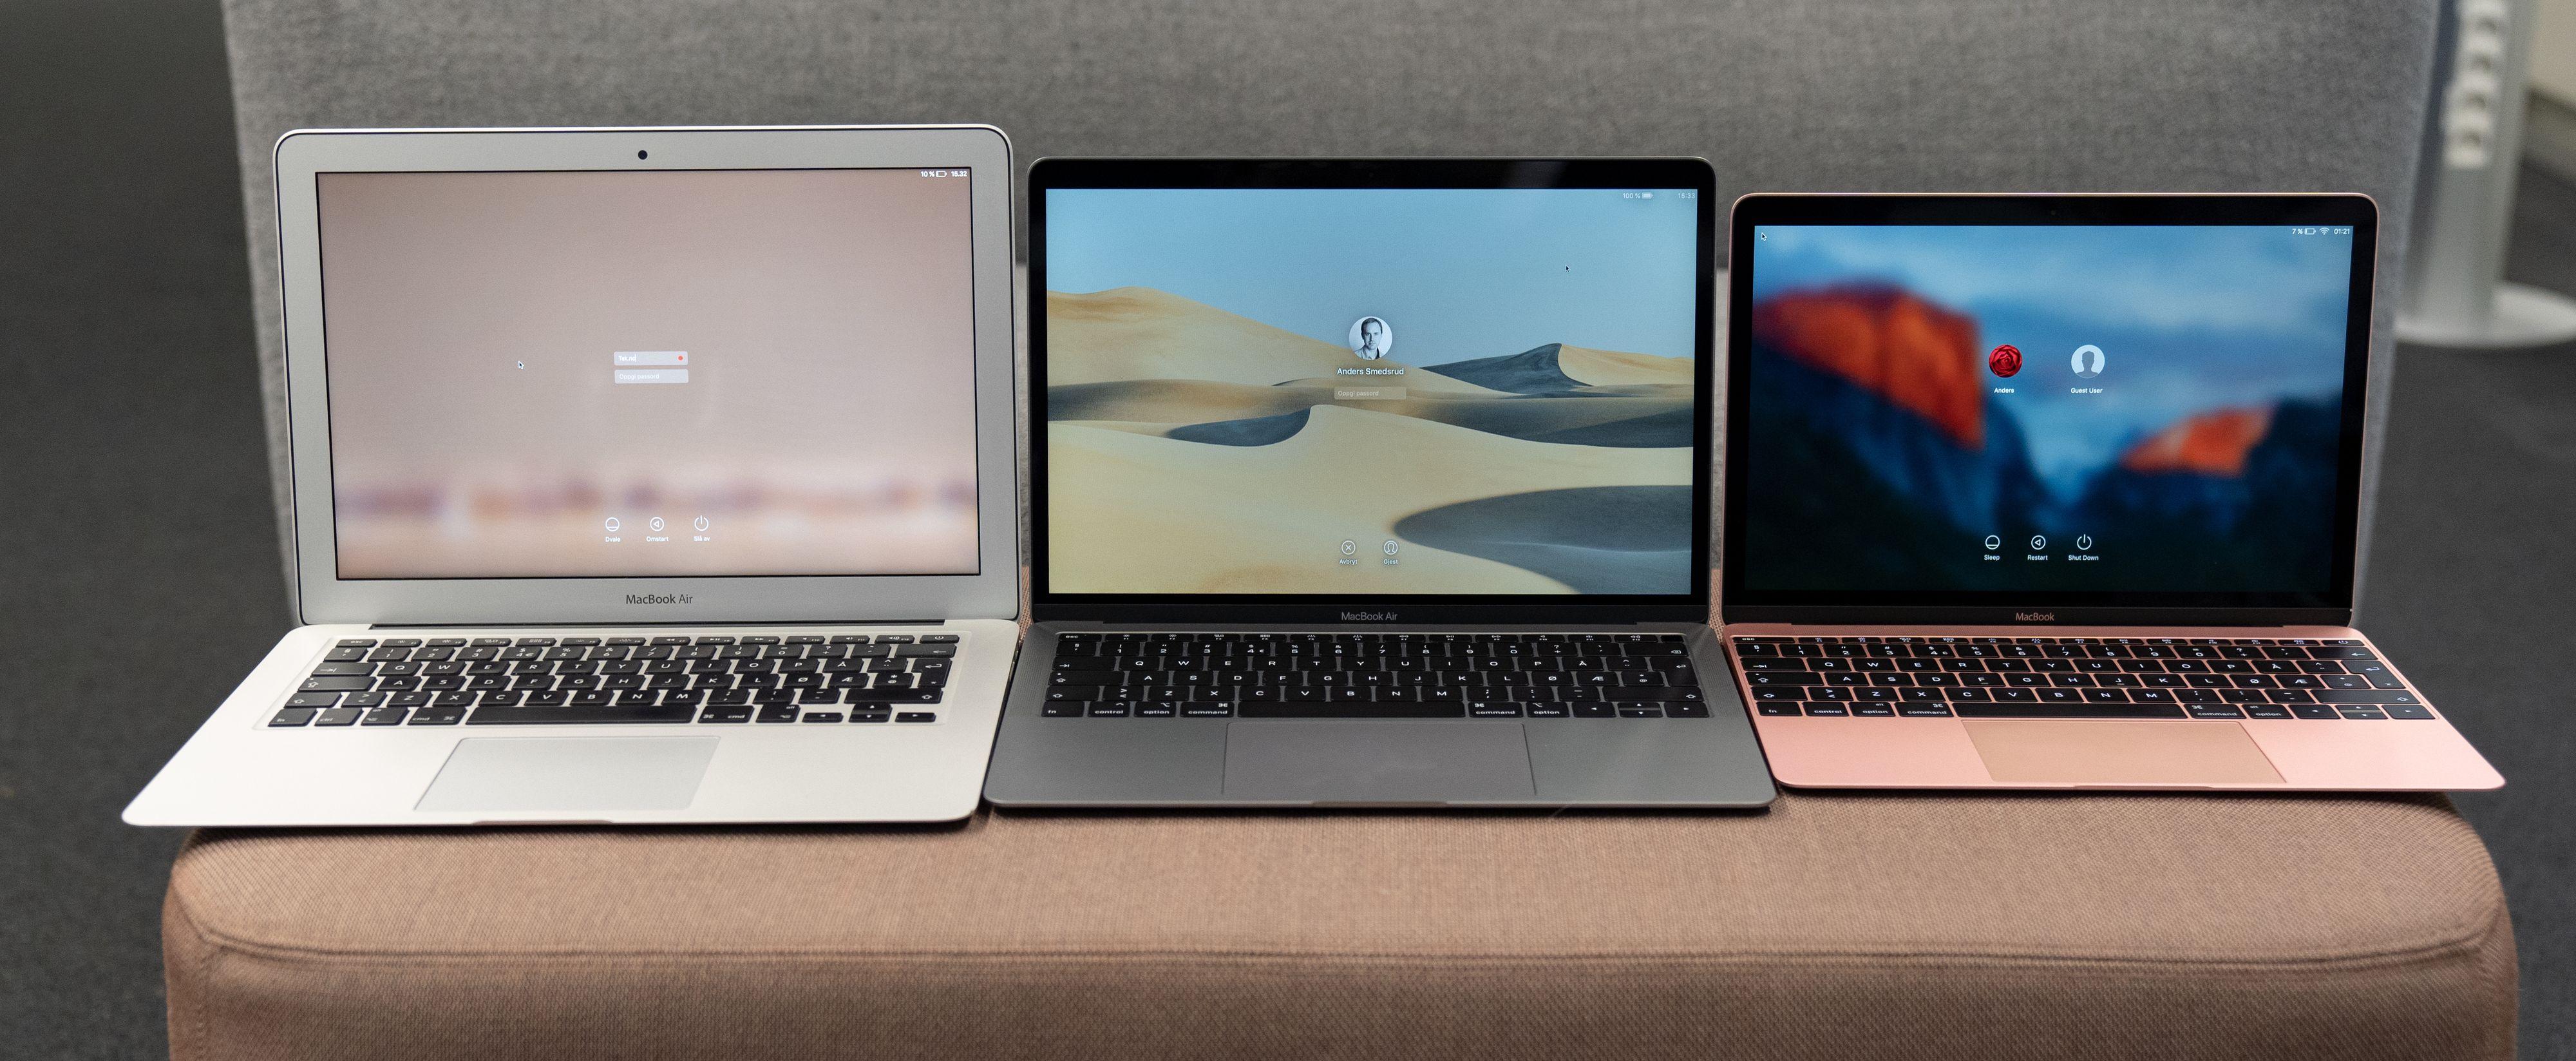 Tripp trapp tresko - fra venstre til høyre: Gamle MacBook Air 13, nye MacBook Air 13 og MacBook 12.